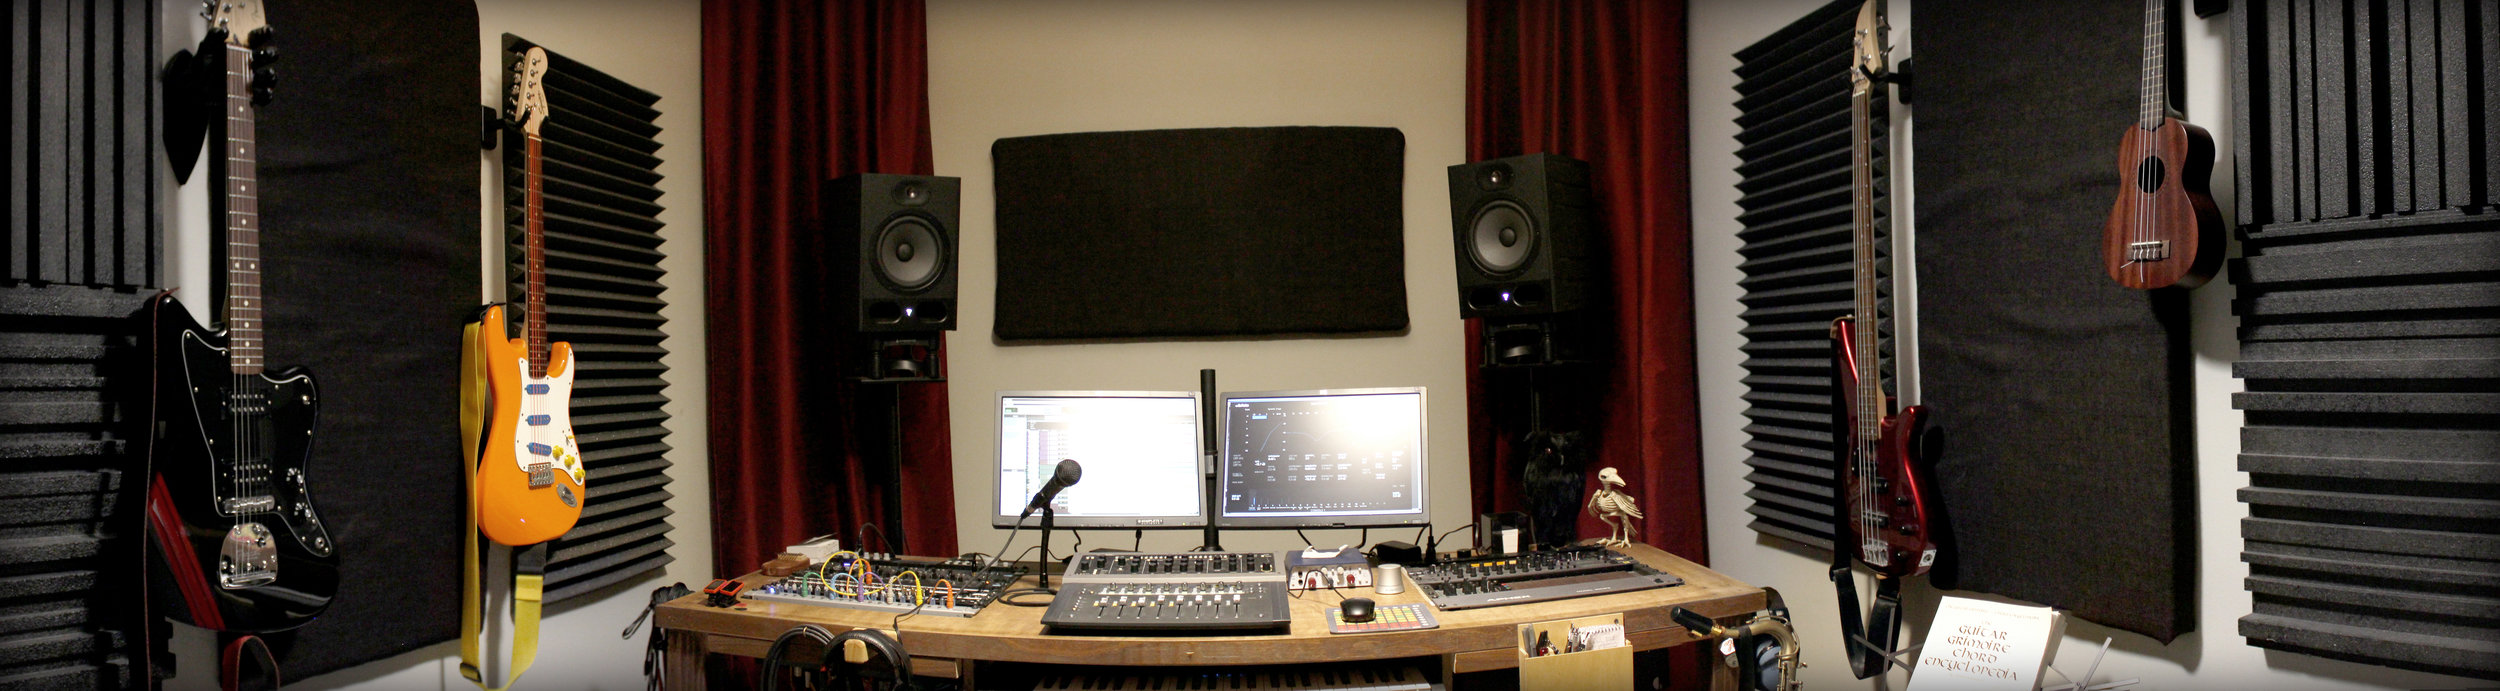 Mixing Room Panorama